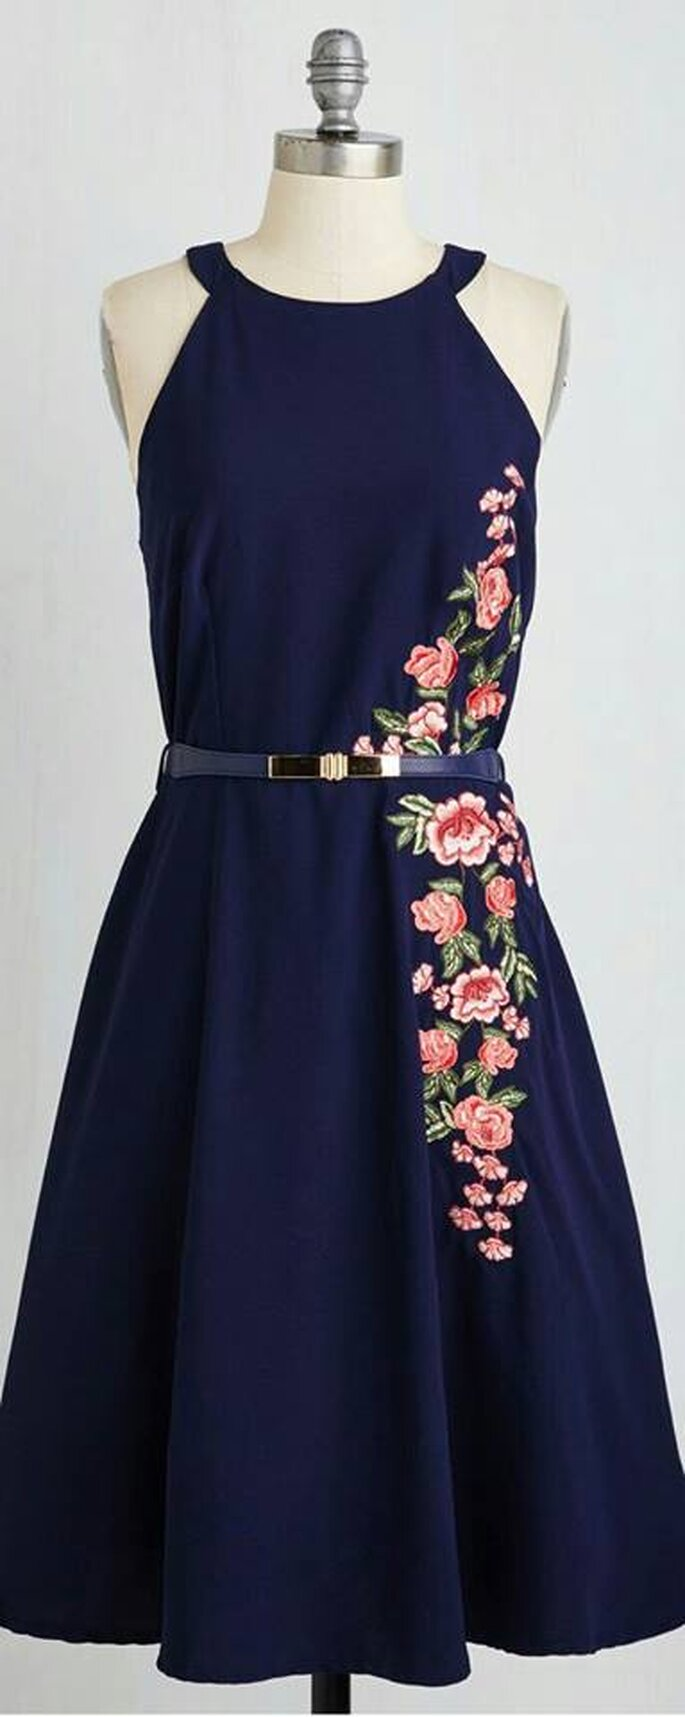 Photo Source: Naaz The Designer Boutique